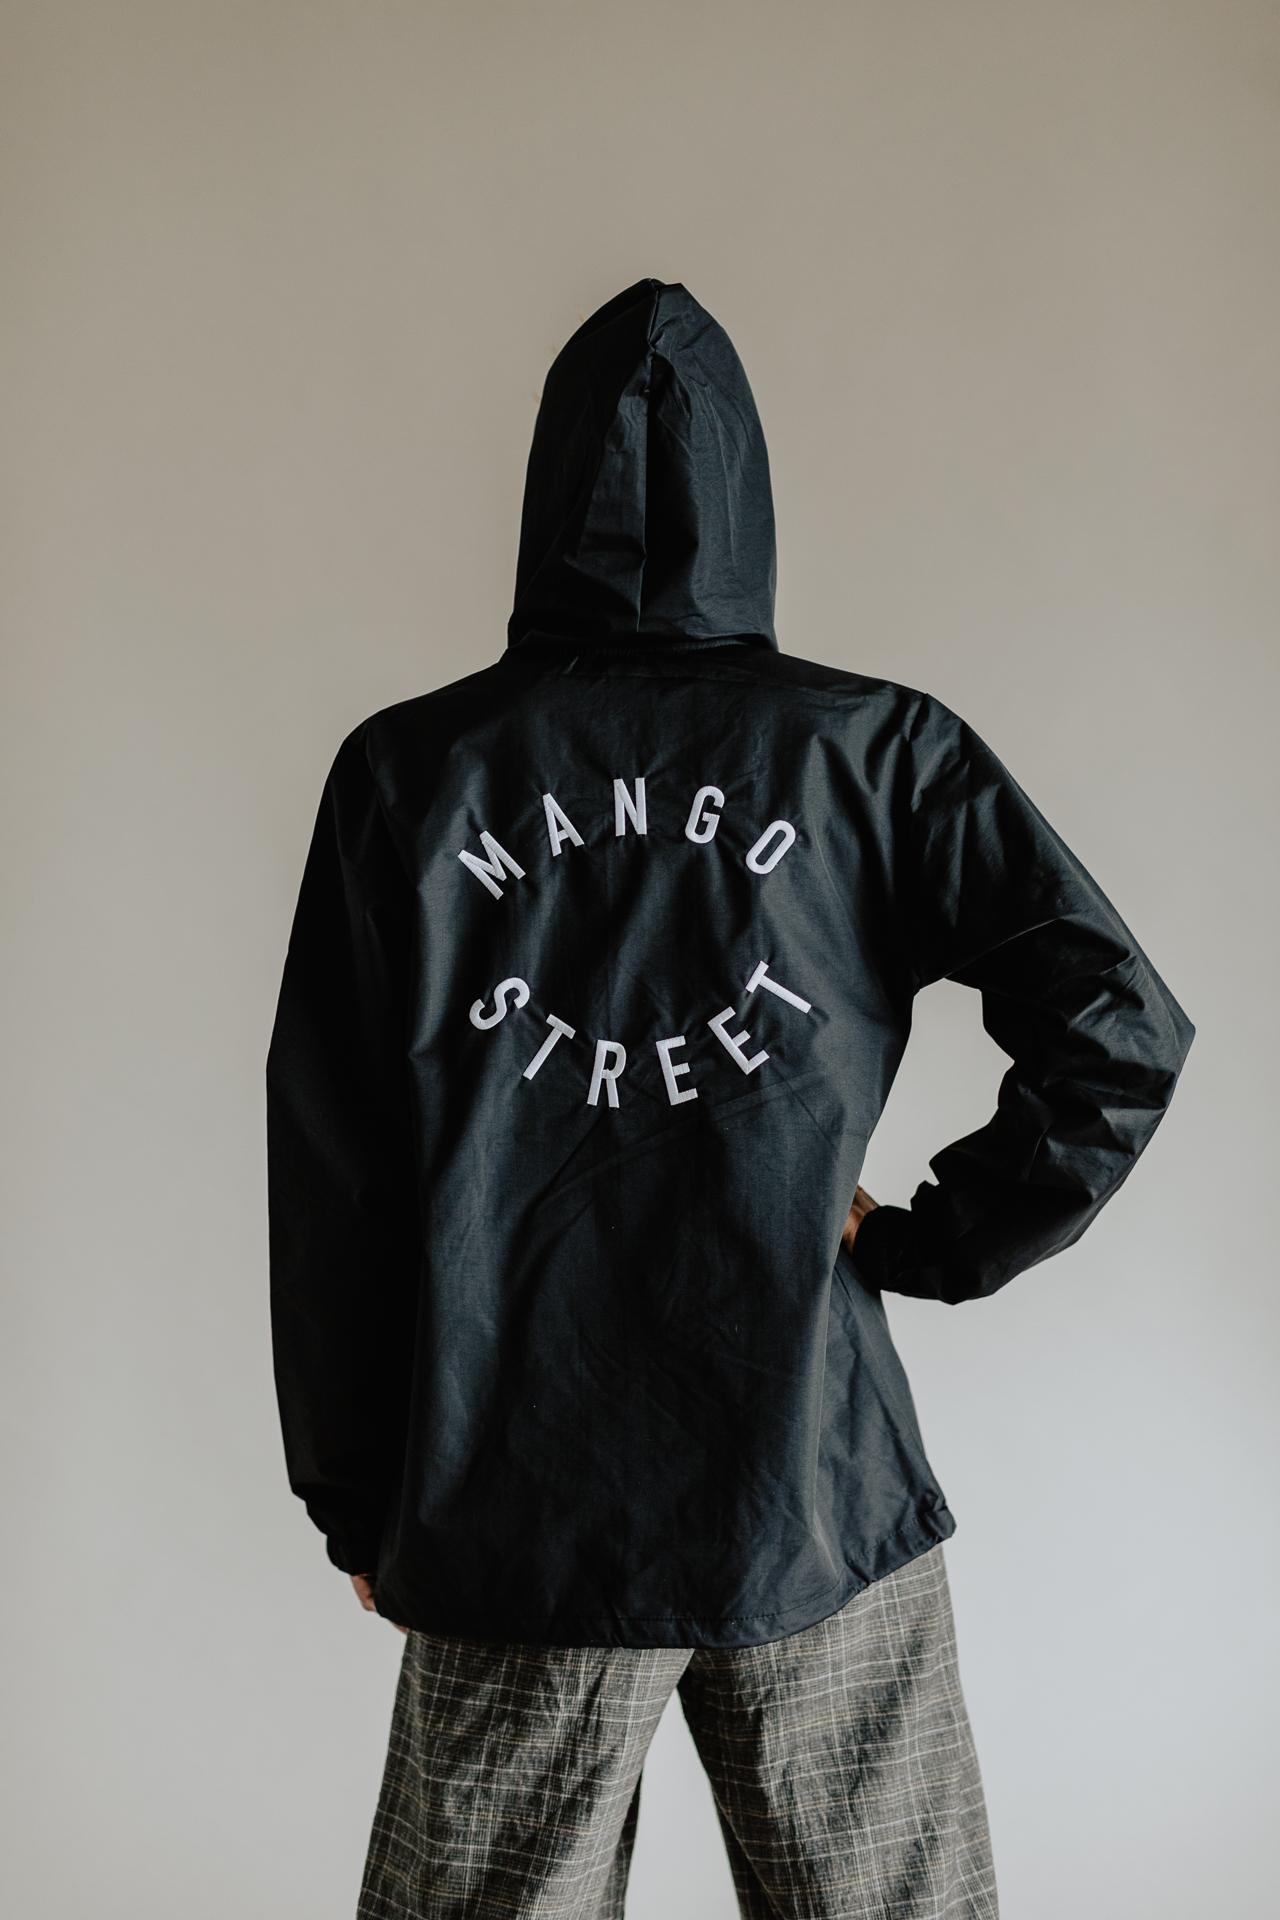 mango street lookbook-6306.jpg